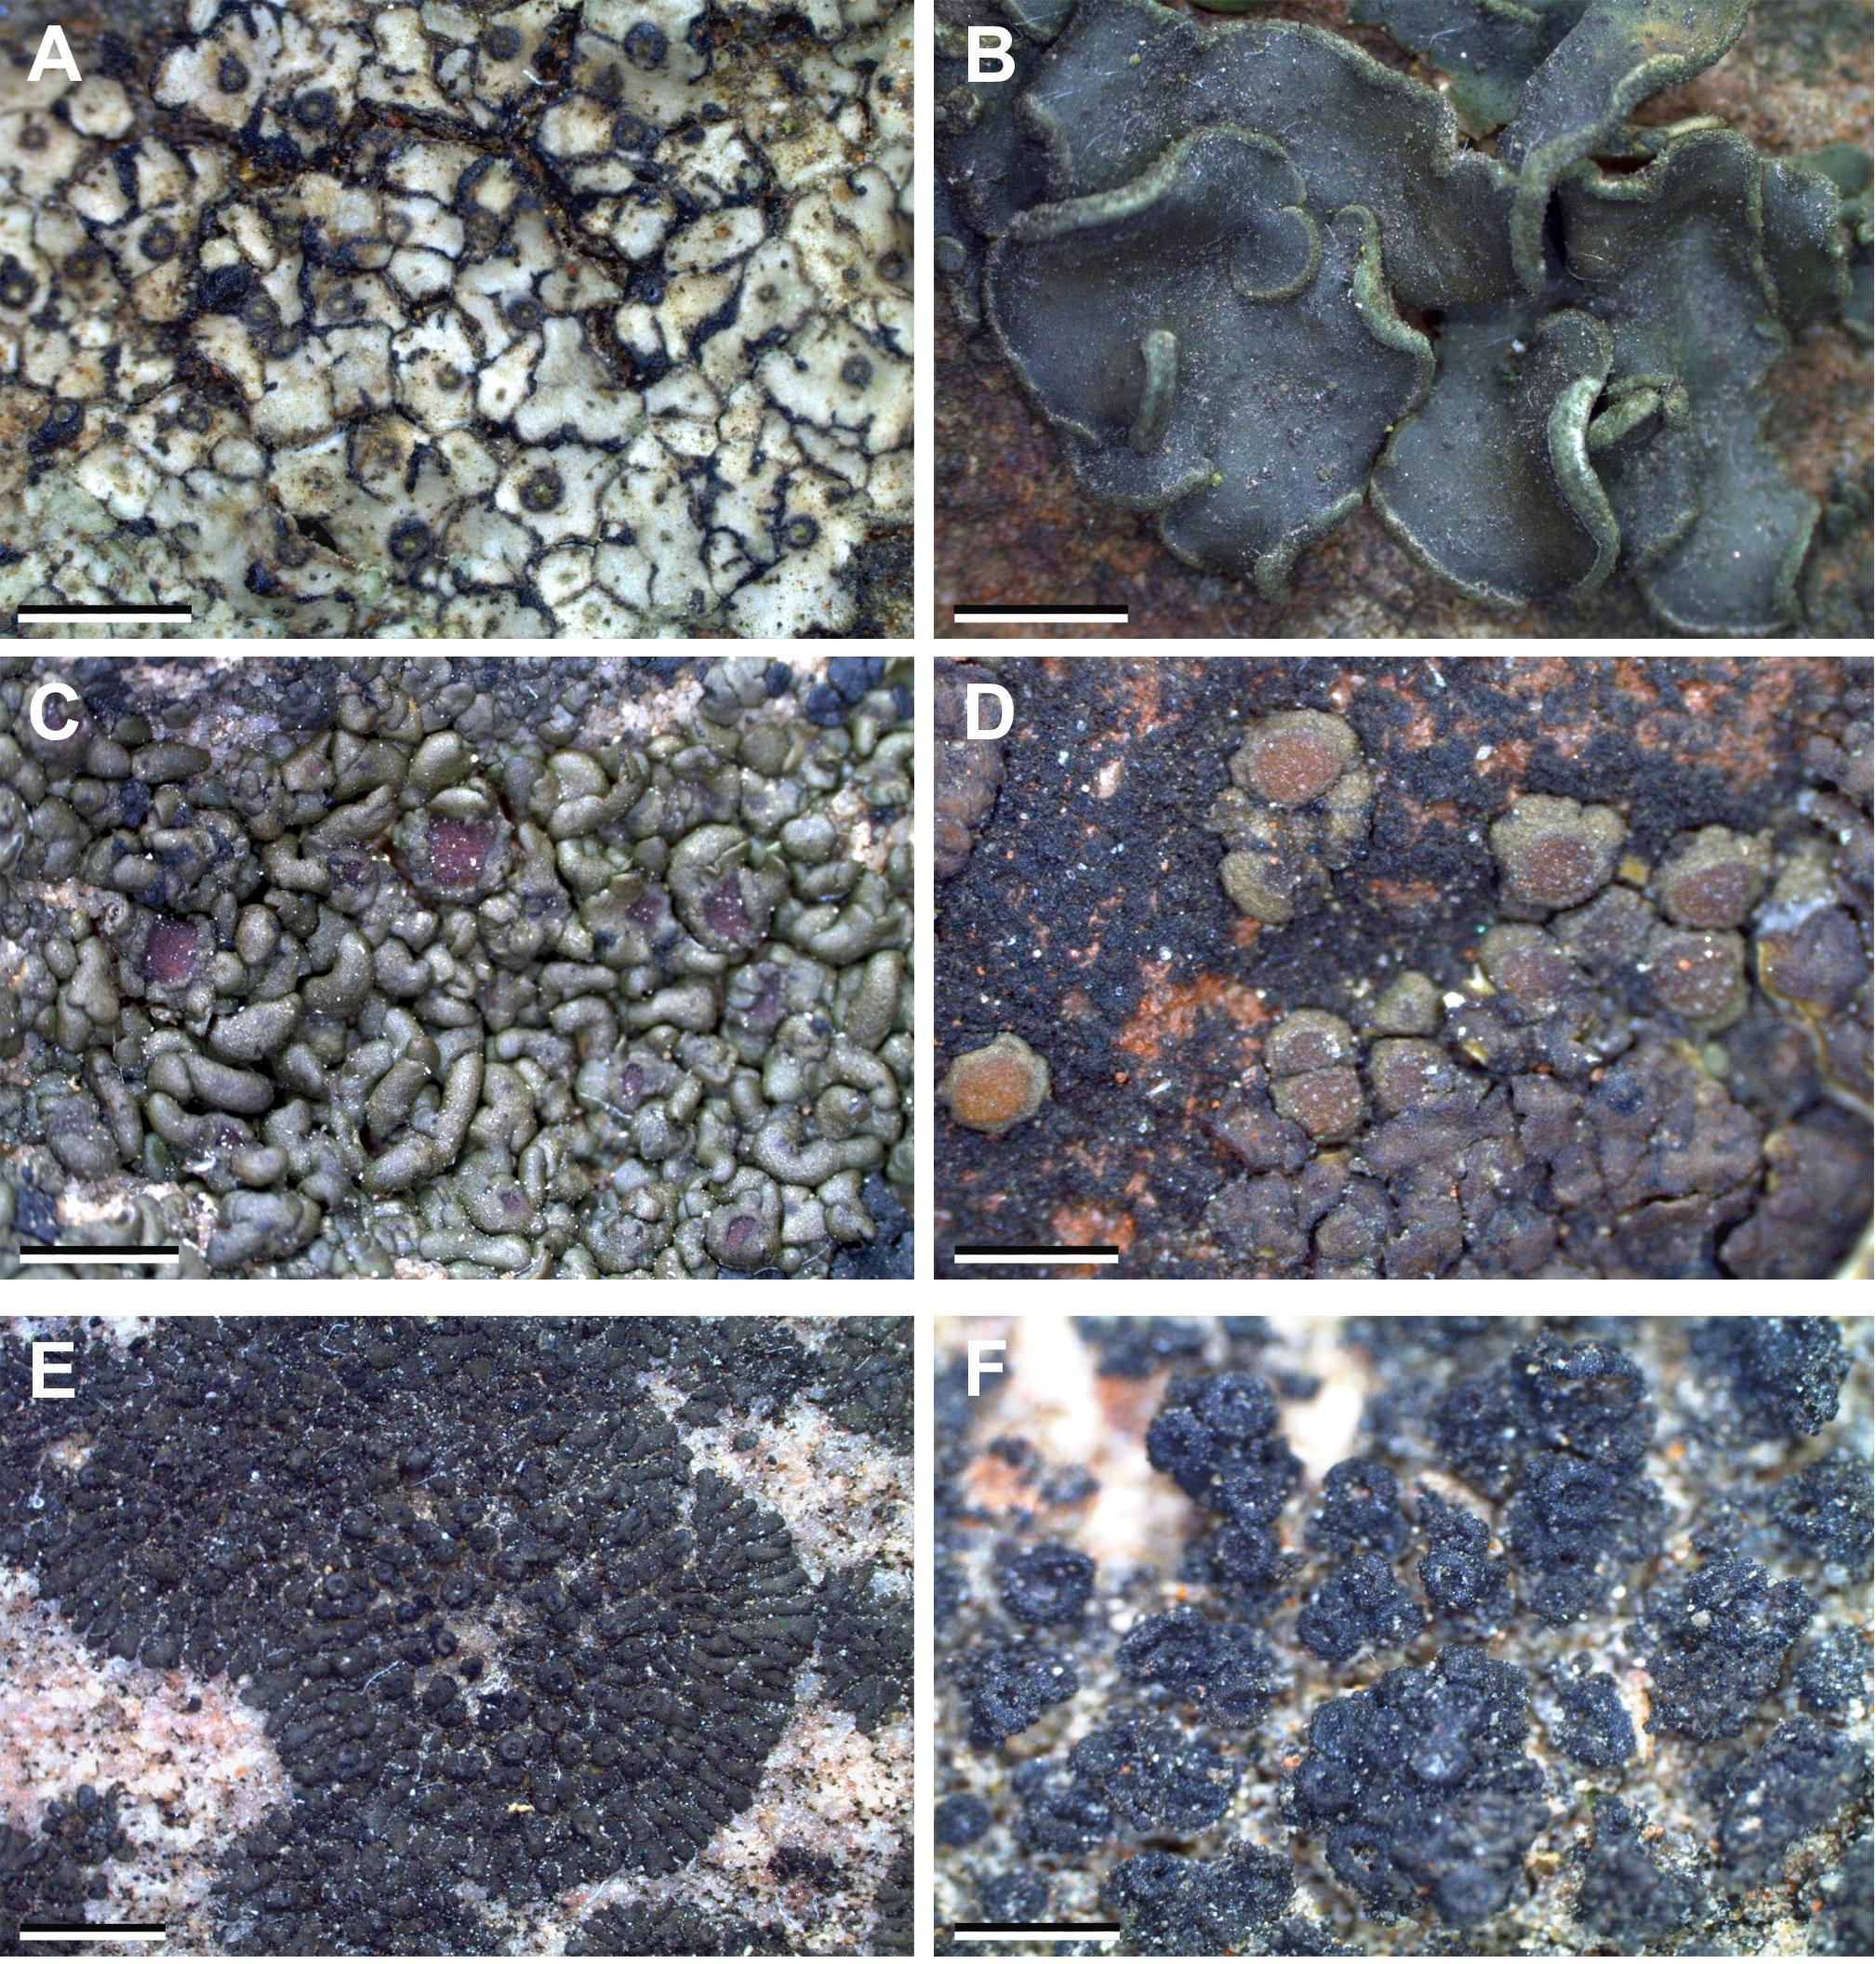 Some common lichen species reported from the study area: A, Endocarpon subrosettum Ajay Singh & Upreti; B, Peltula euploca (Ach.) Poelt in Pisut; C, Peltula obscurans (Nyl.) Gyeln.; D, Peltula patellata (Bagl.) Swinscow & Krog; E, Peltula placodizans (Zahlbr.) Wetmore; F, Phylliscum indicum Upreti. [Scale bars: A–F = 2 mm]